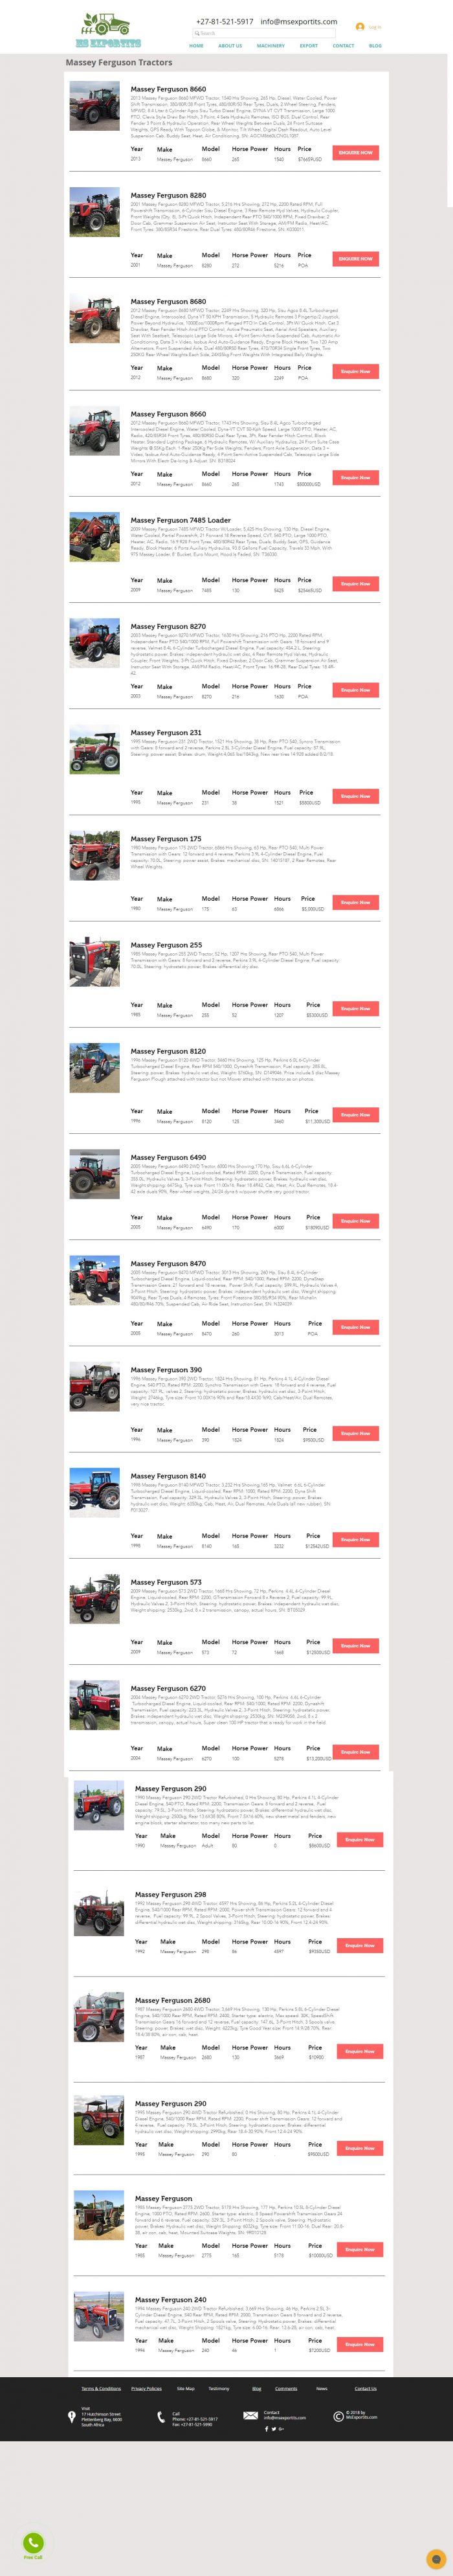 Massey ferguson 175 tractor for sale